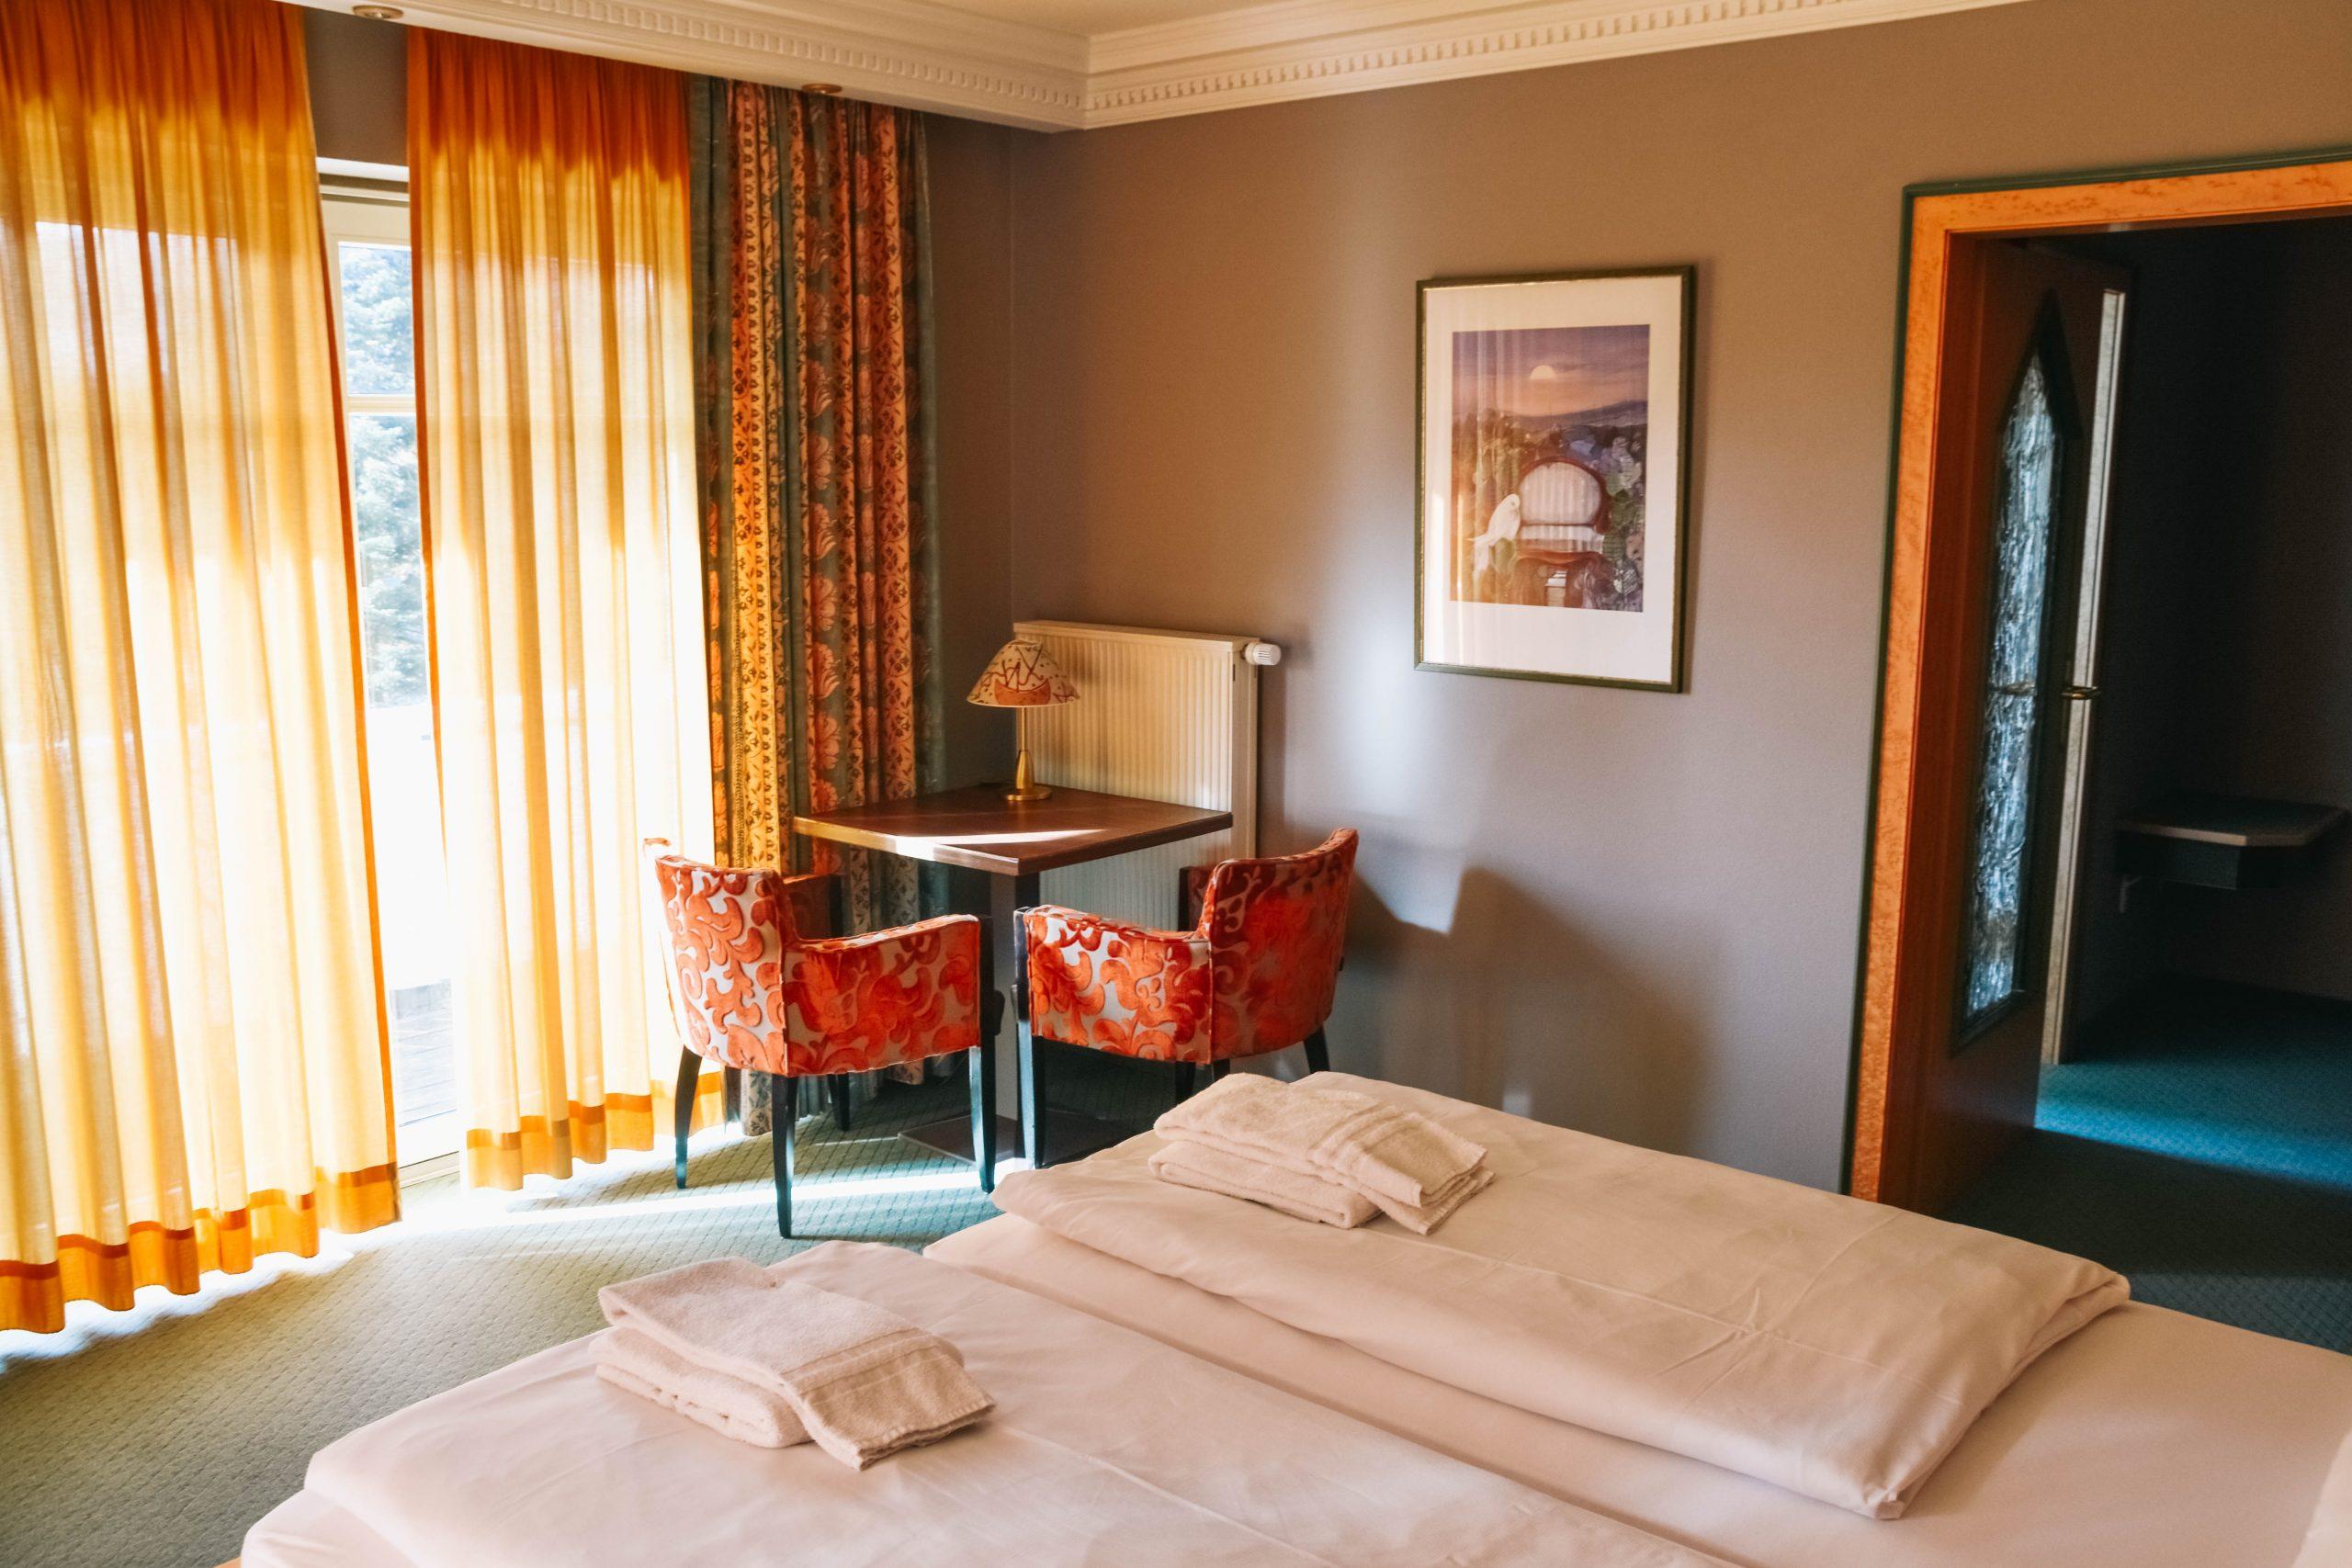 Duitse kamer aanzicht 2 Parkhotel Schmallenberg